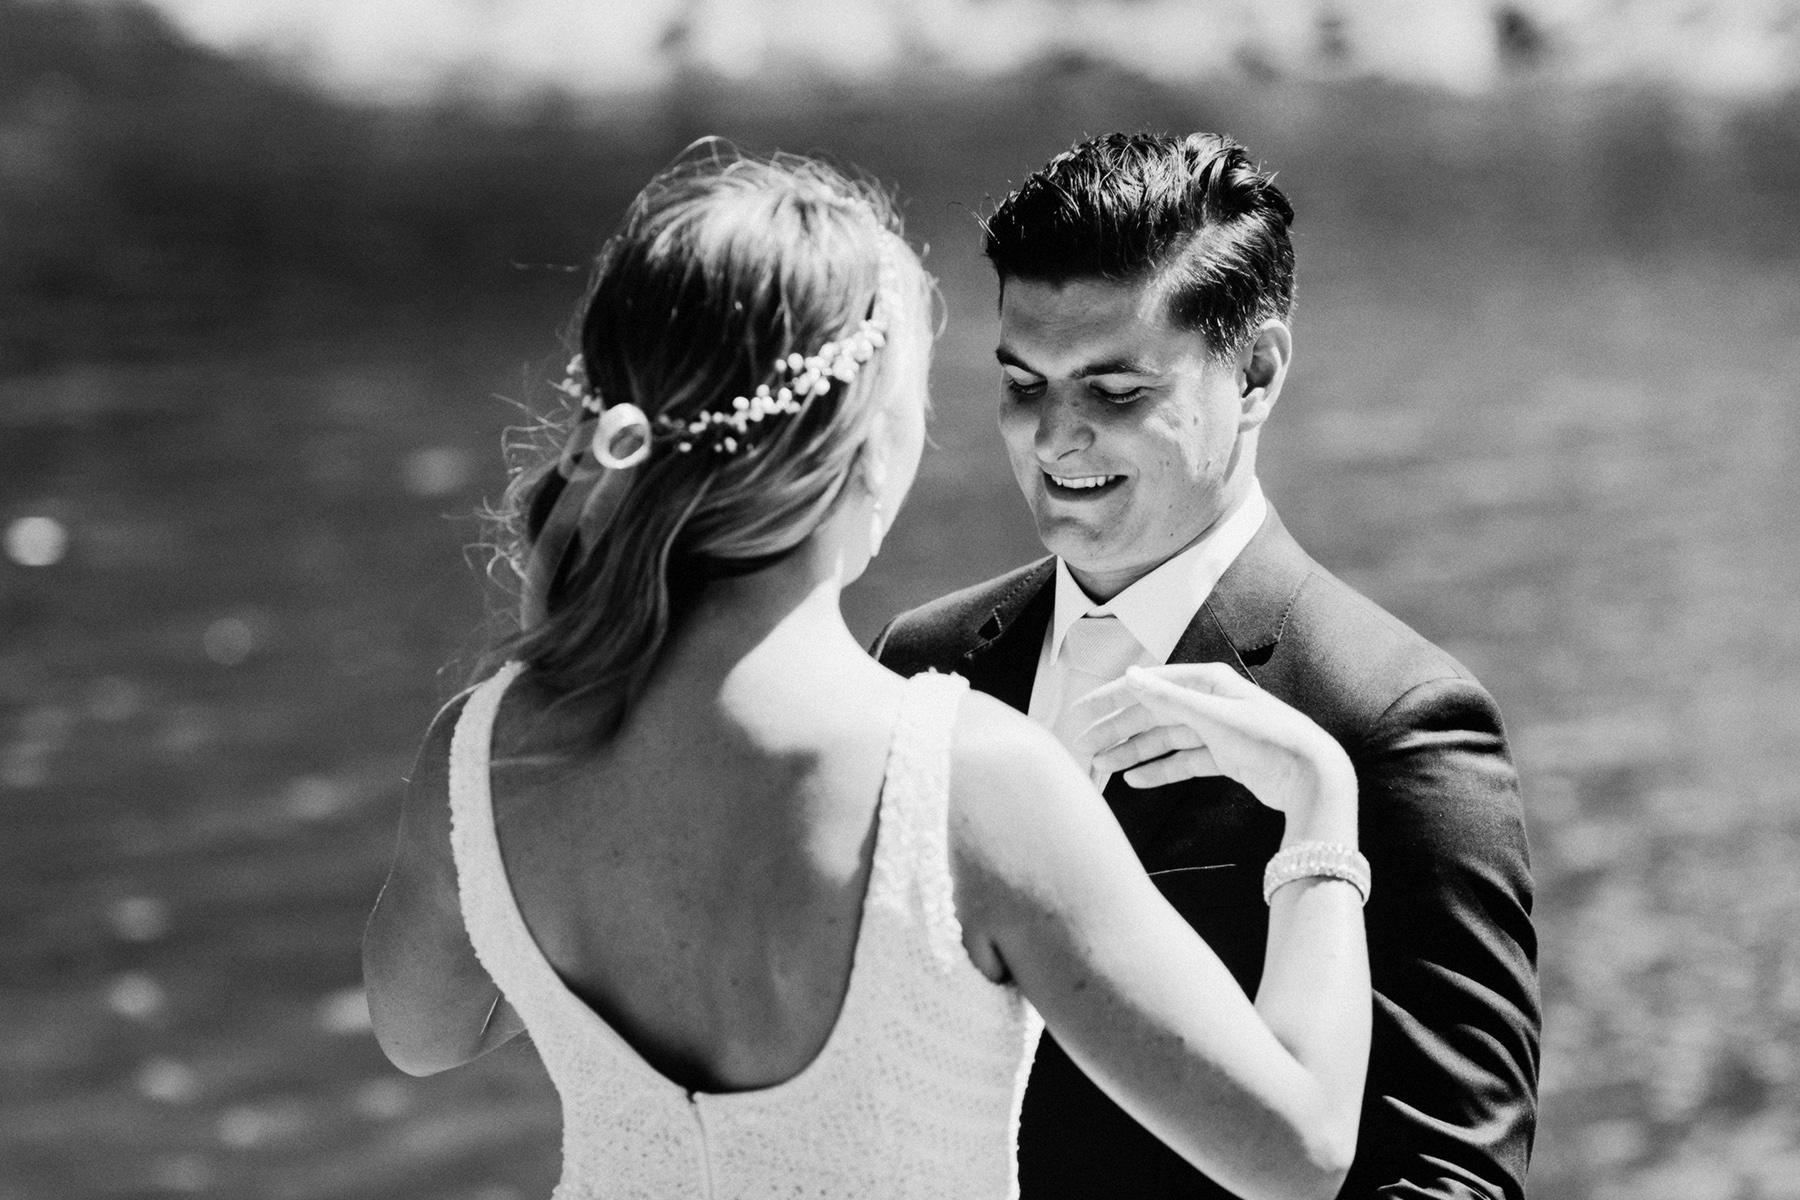 galiano-island-bodega-destination-wedding-0036.JPG